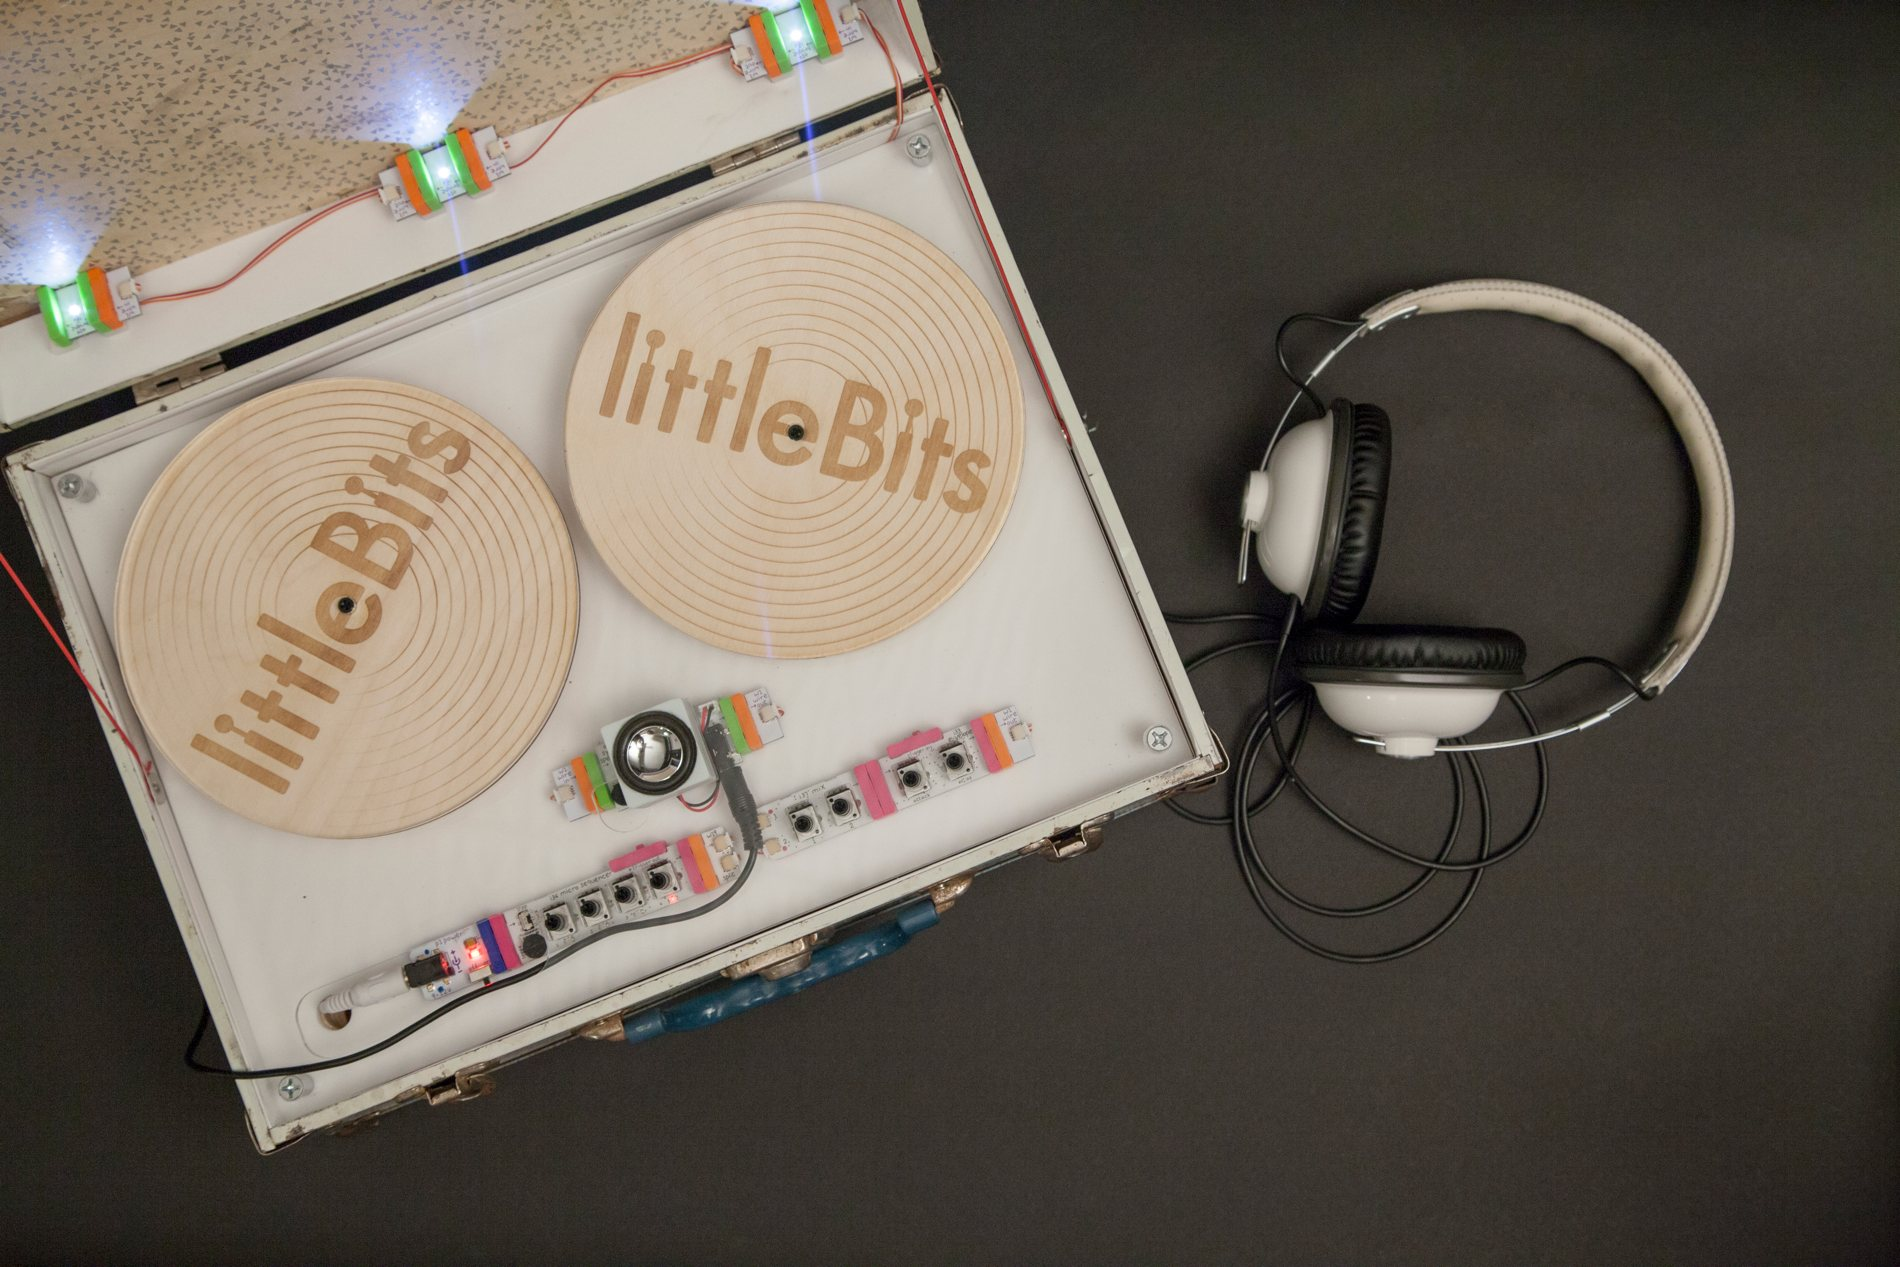 LittleBitsSynth